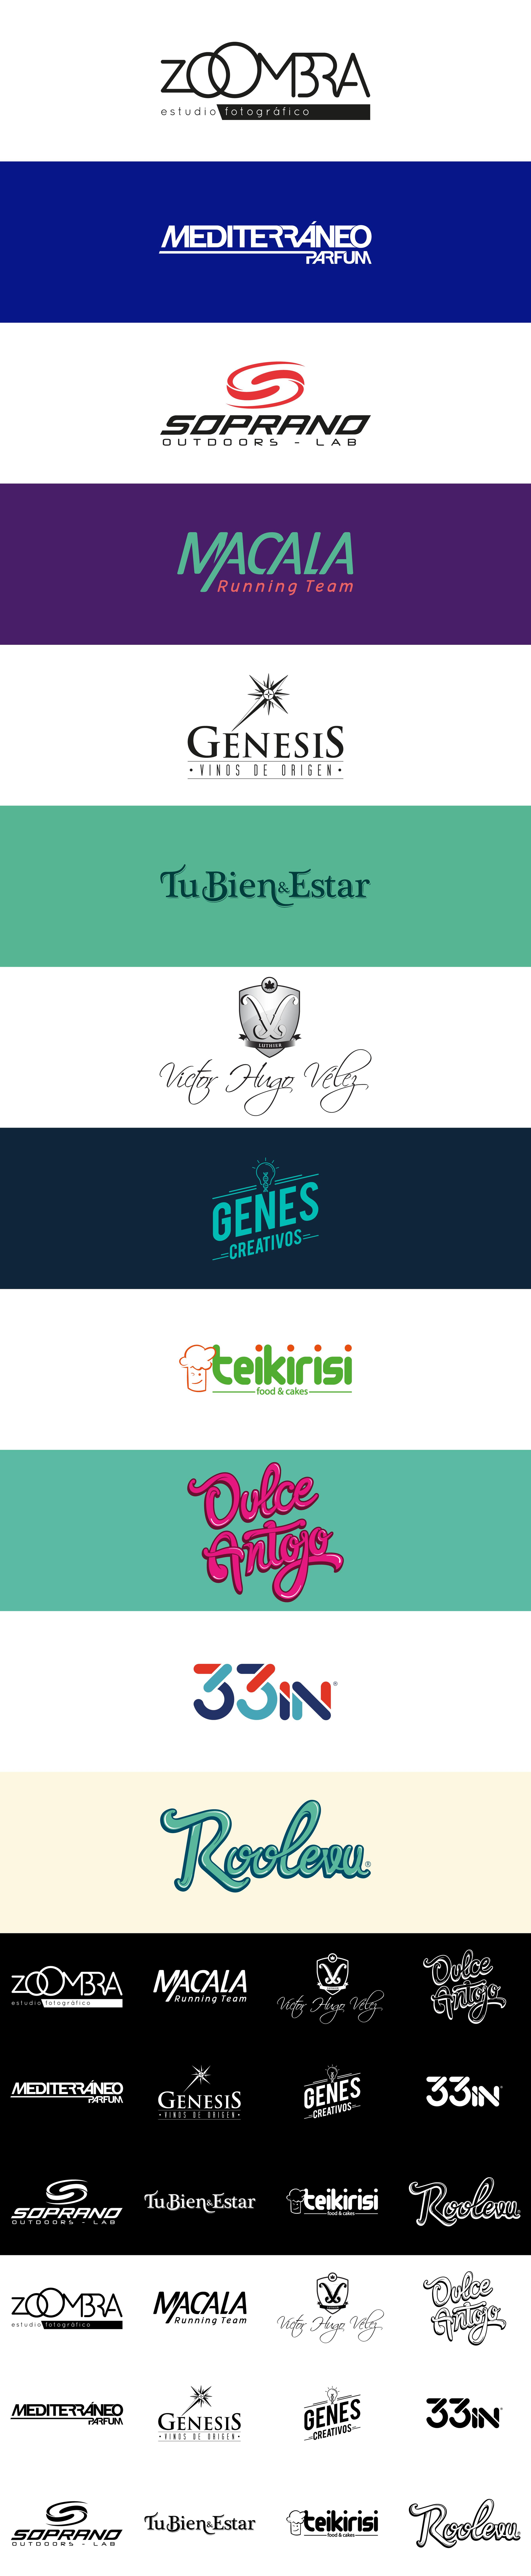 Logos funjuan